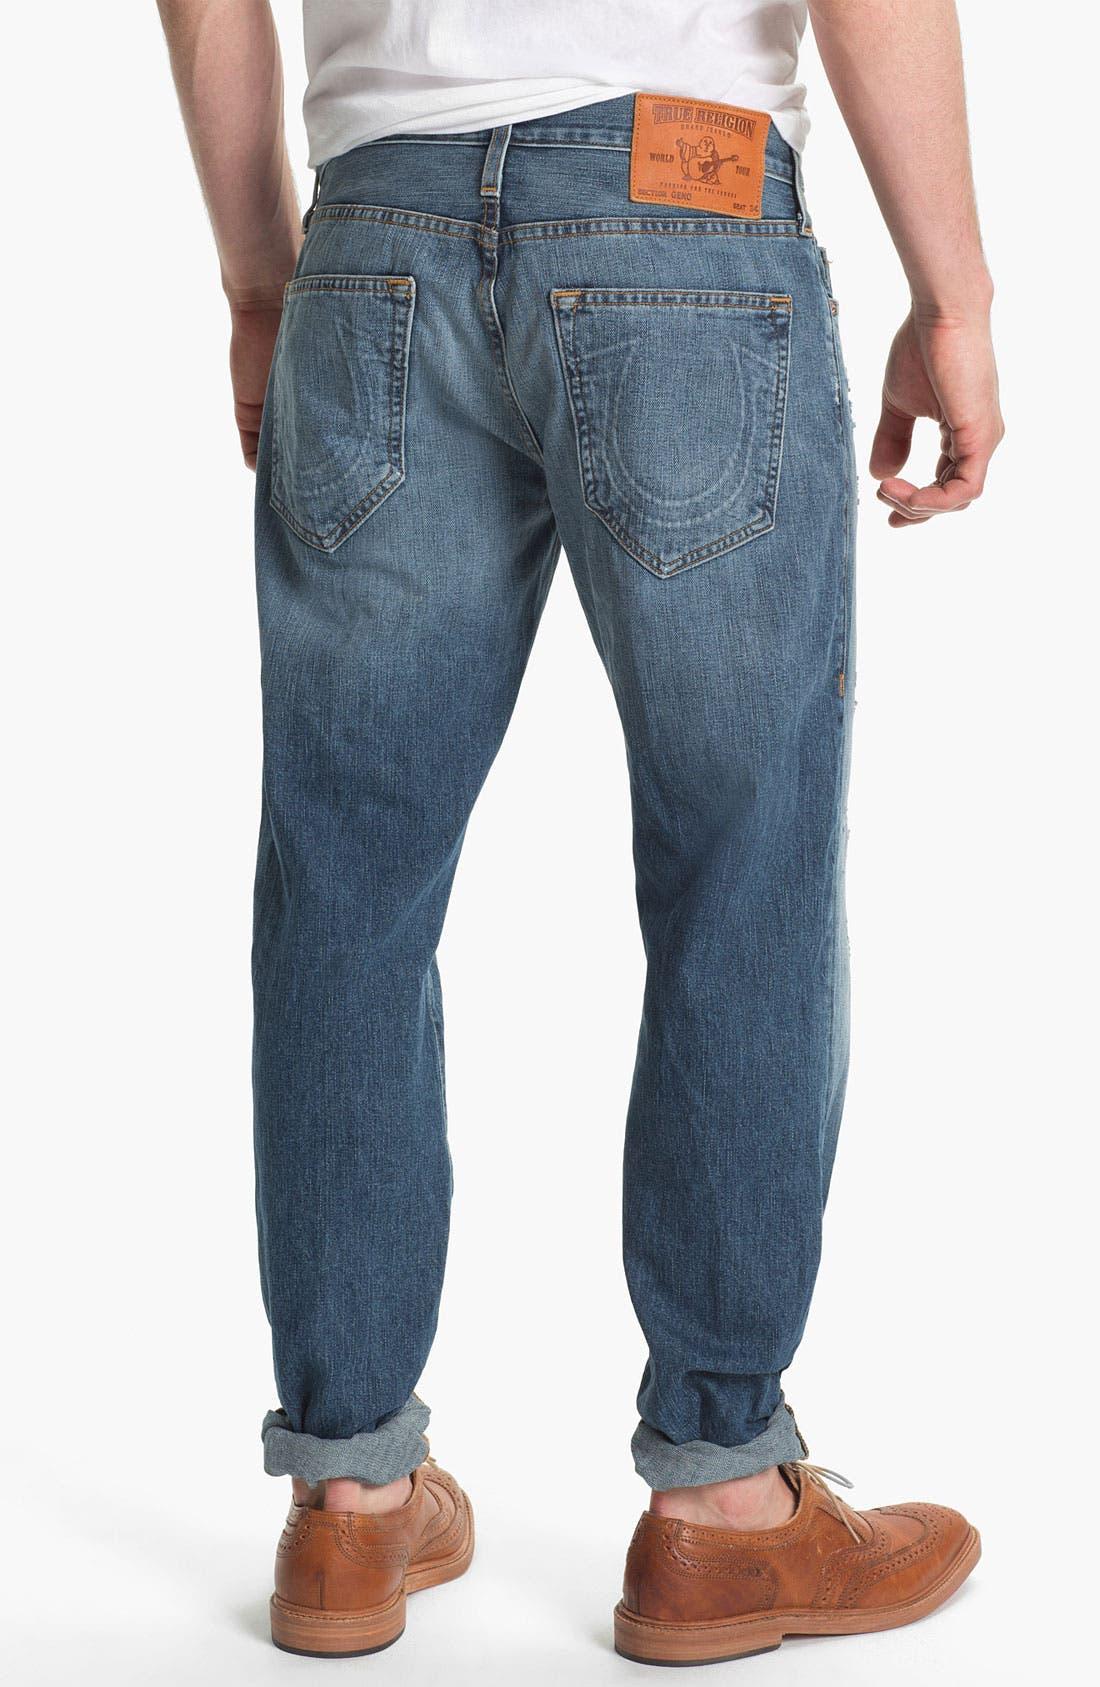 Alternate Image 1 Selected - True Religion Brand Jeans 'Geno 1971' Slim Straight Leg Jeans (Sepulvada)